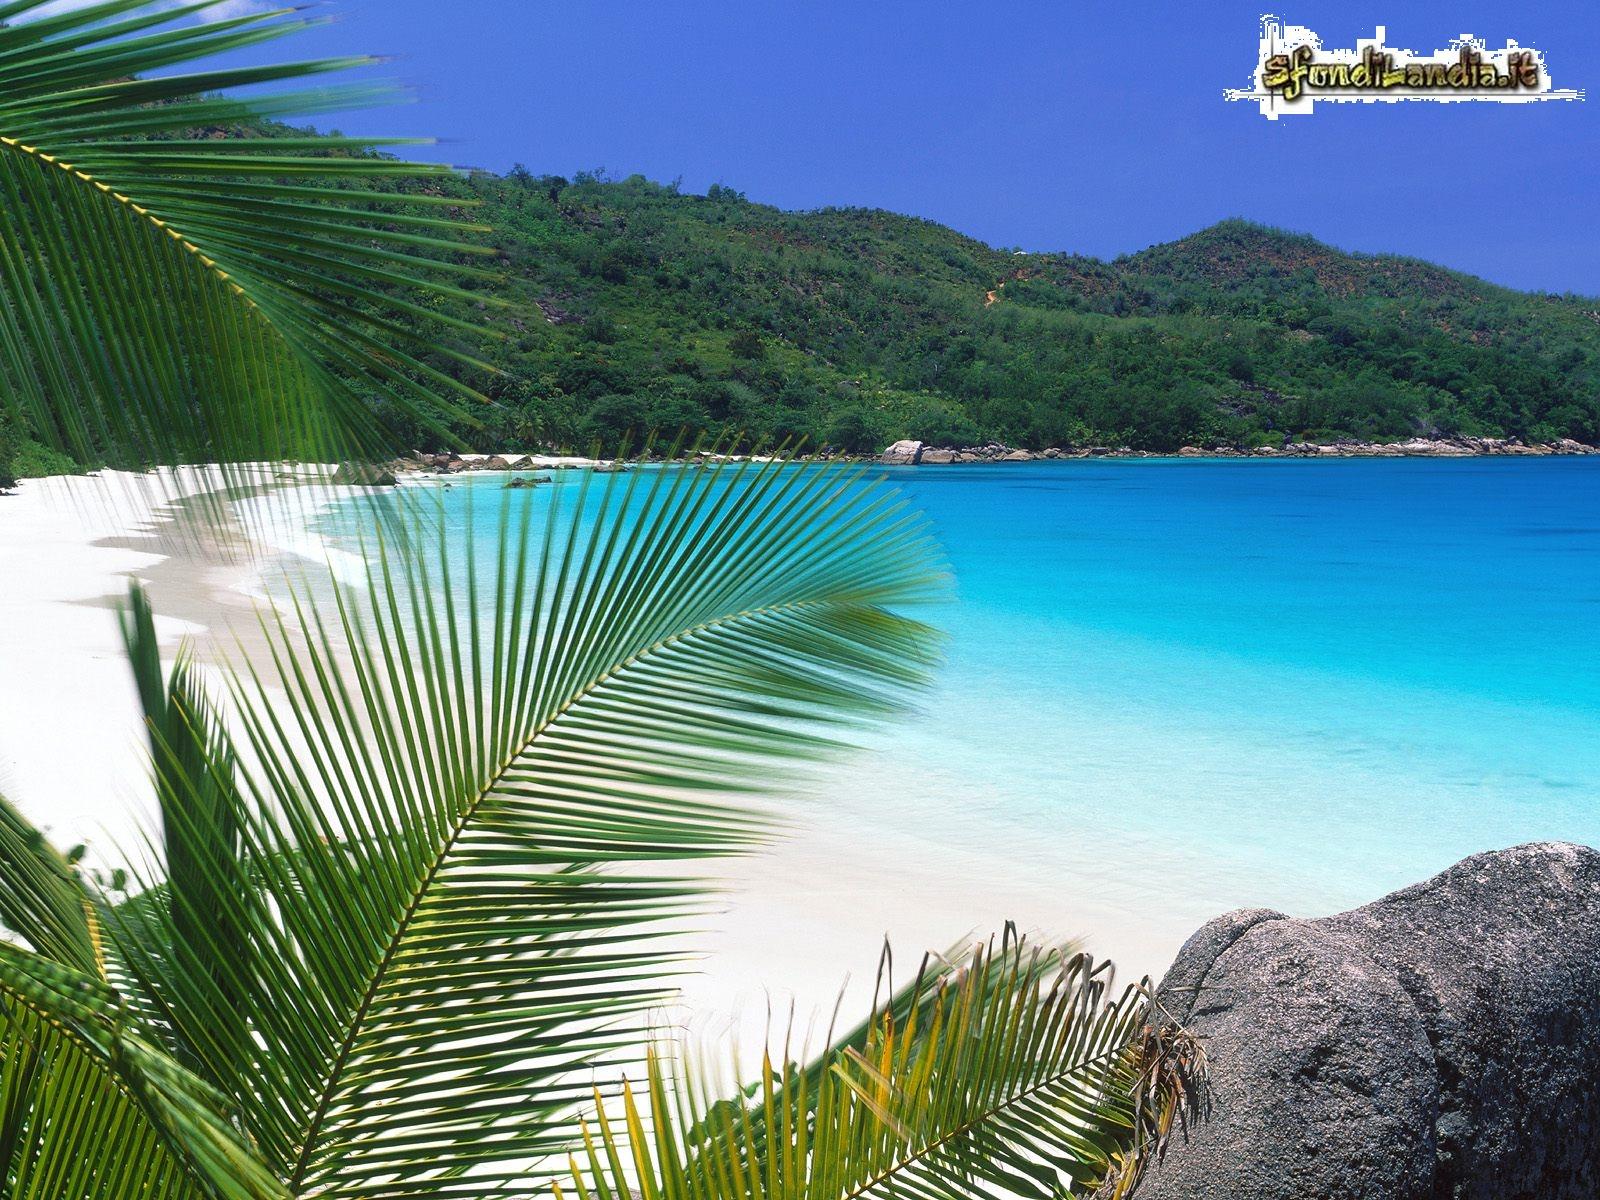 Sfondilandiait Sfondo Gratis Di Riva Tropicale Per Desktop